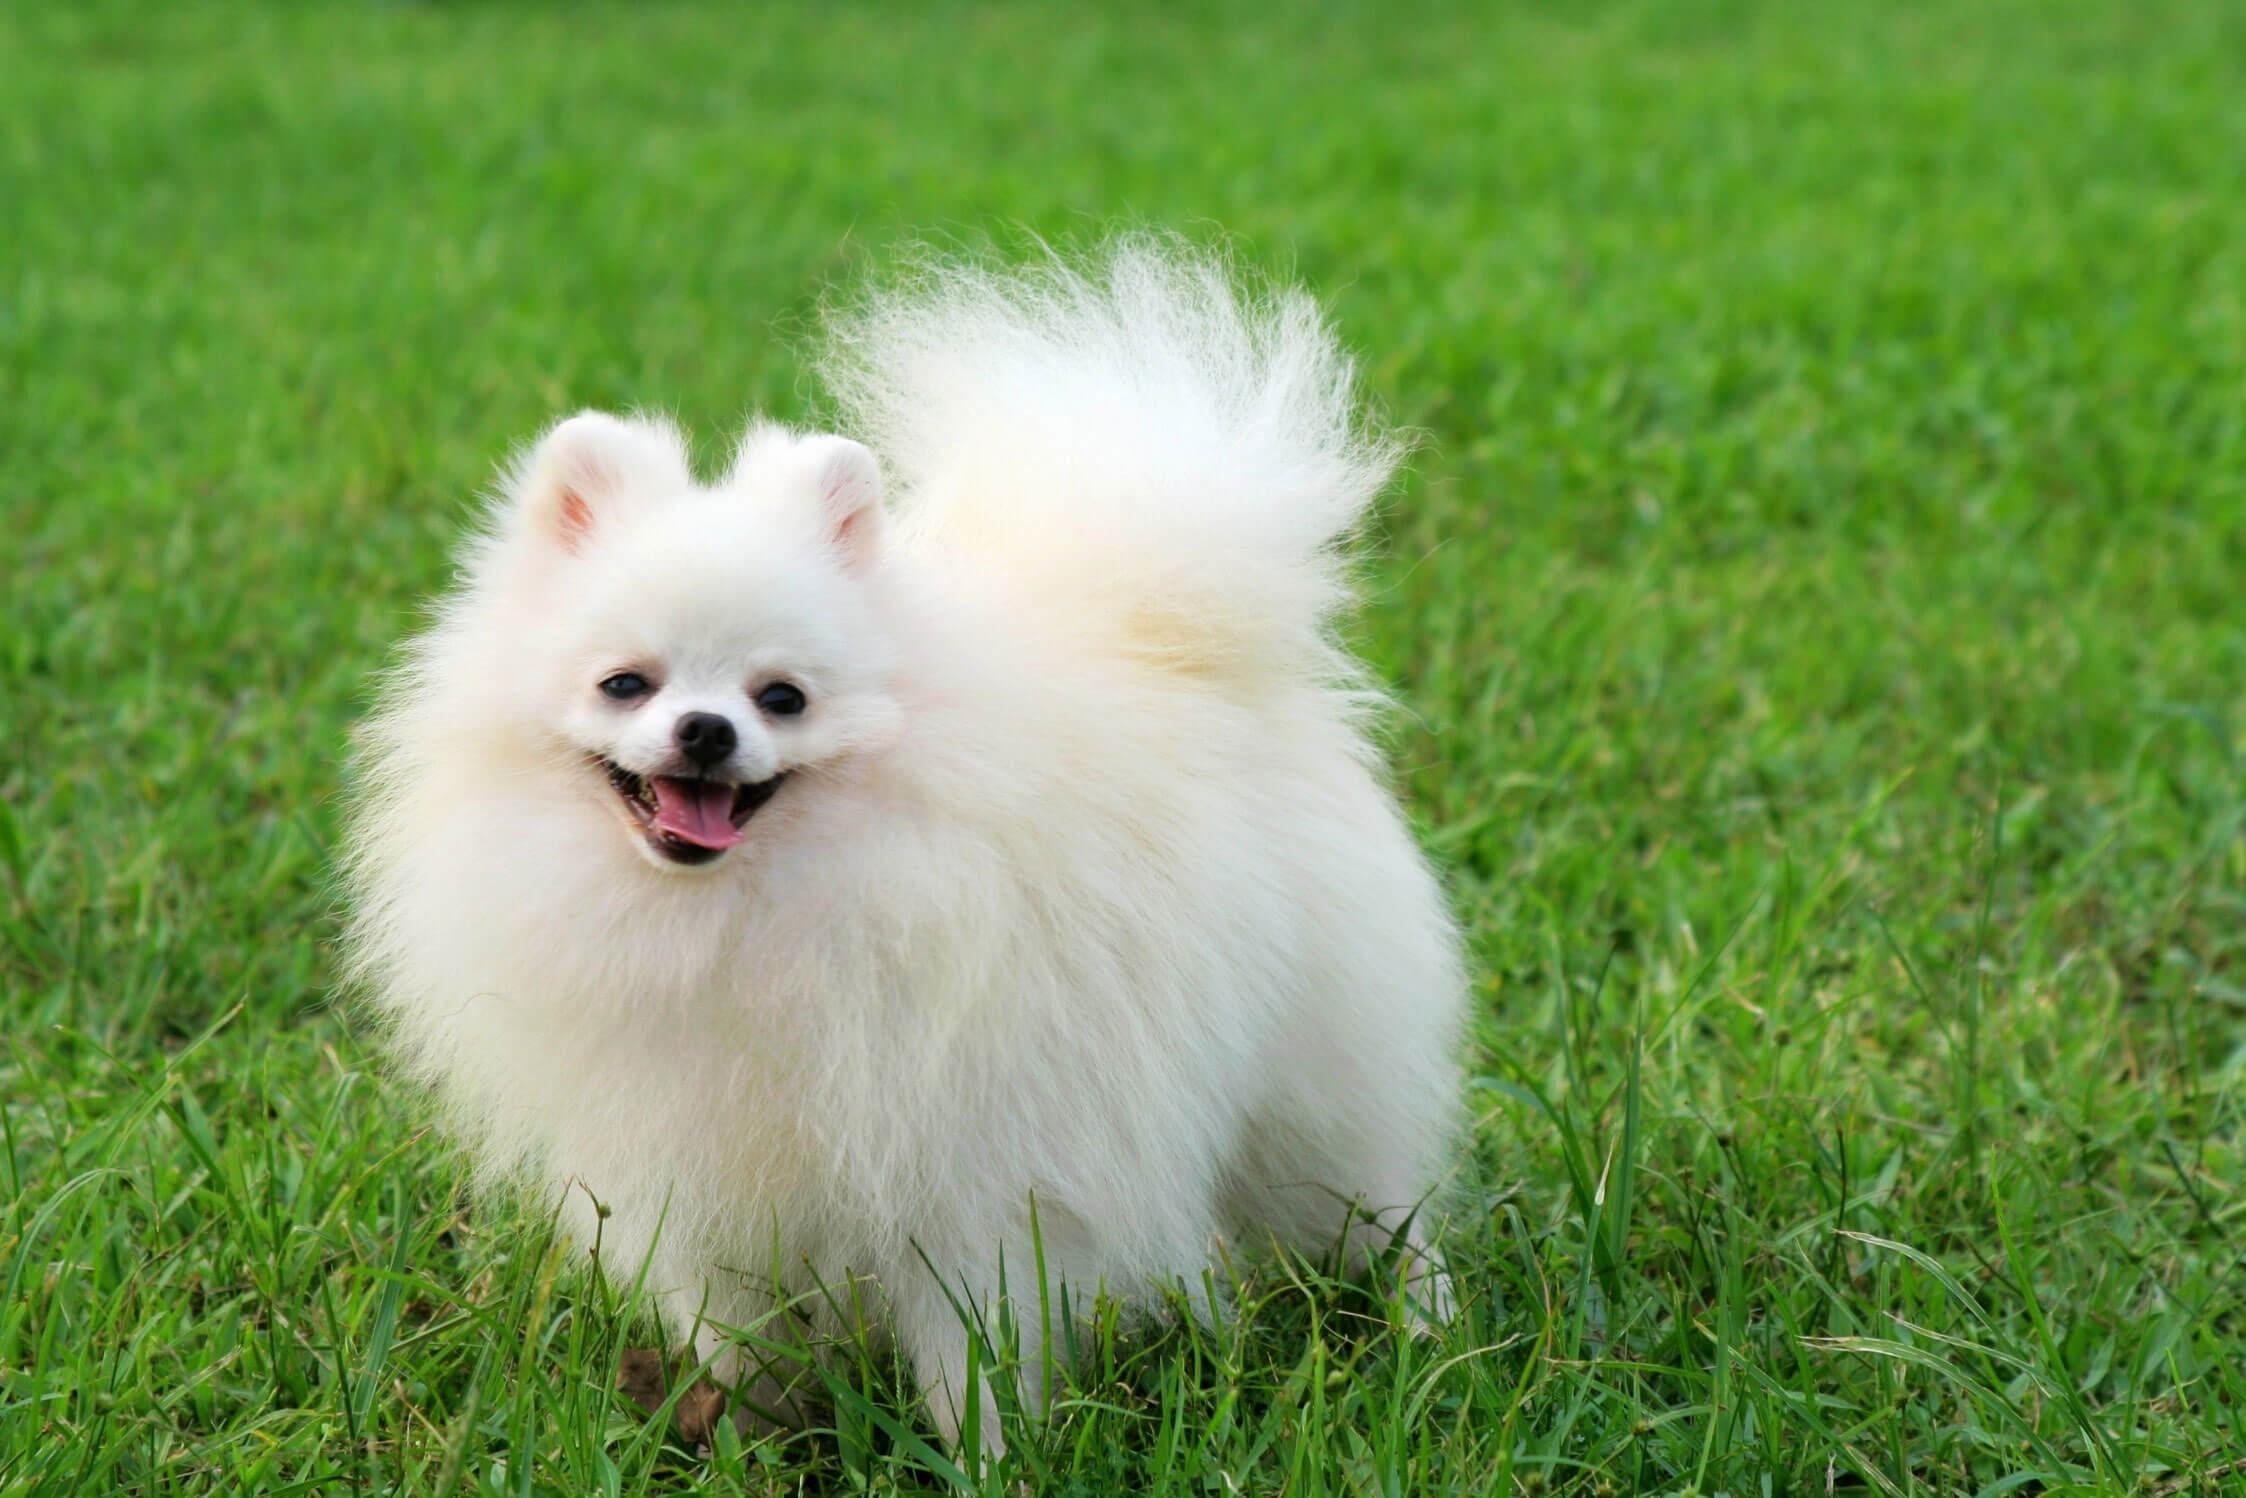 White Pomeranian Images Stock Photos amp Vectors  Shutterstock